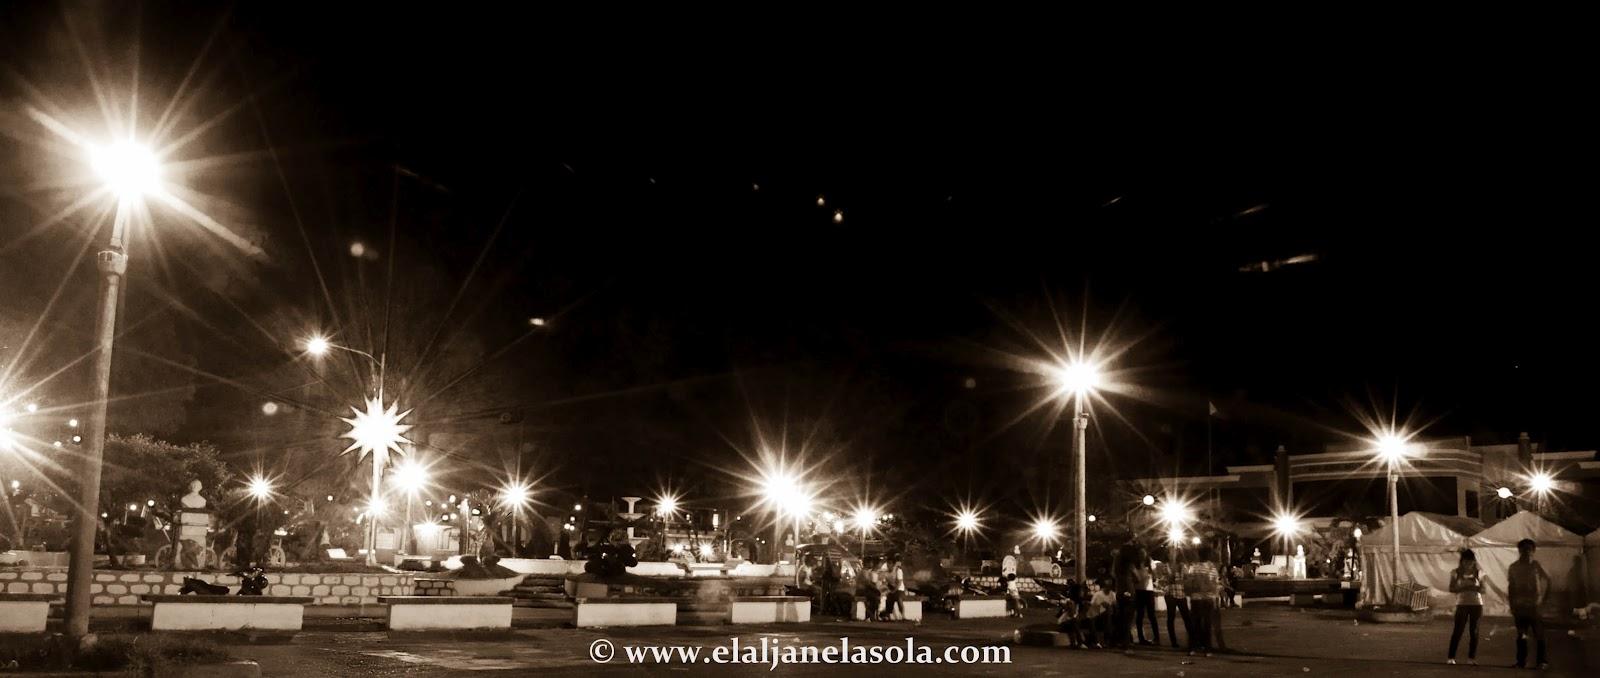 Elal Lasola Travel Photography Occidental Mindoro El